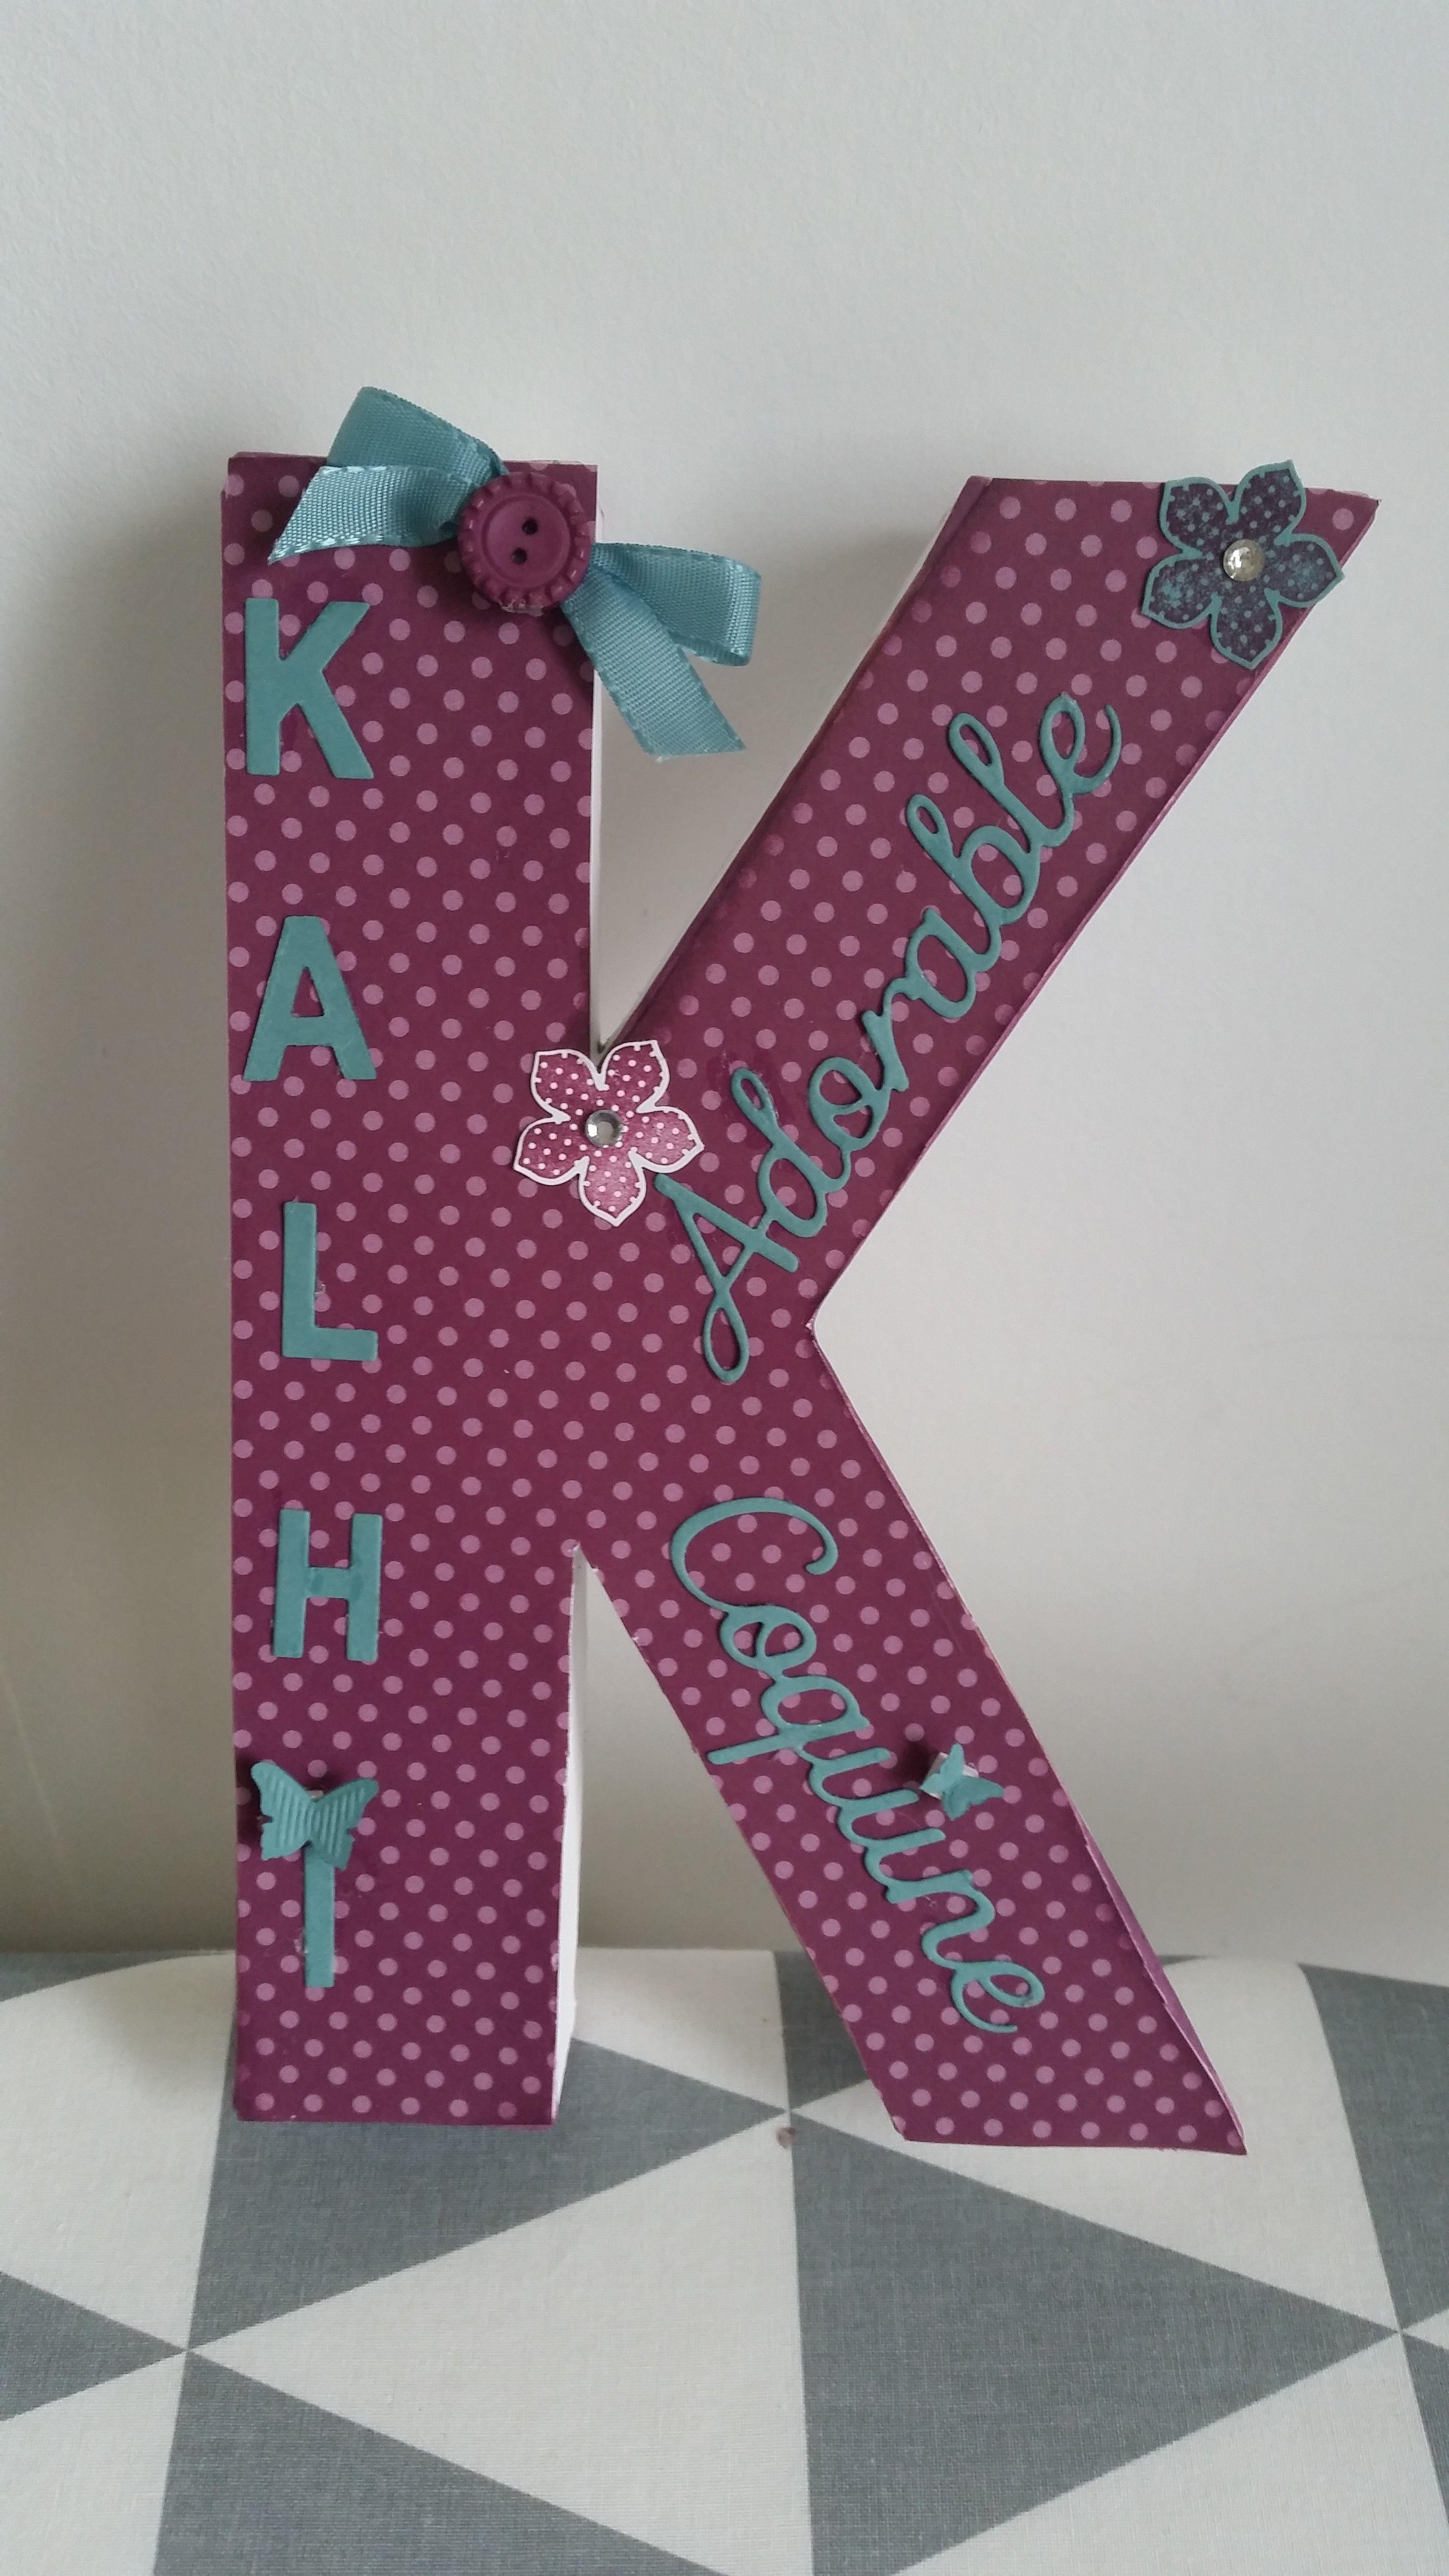 monogramme initiales prenoms scrap crafts letters symbols